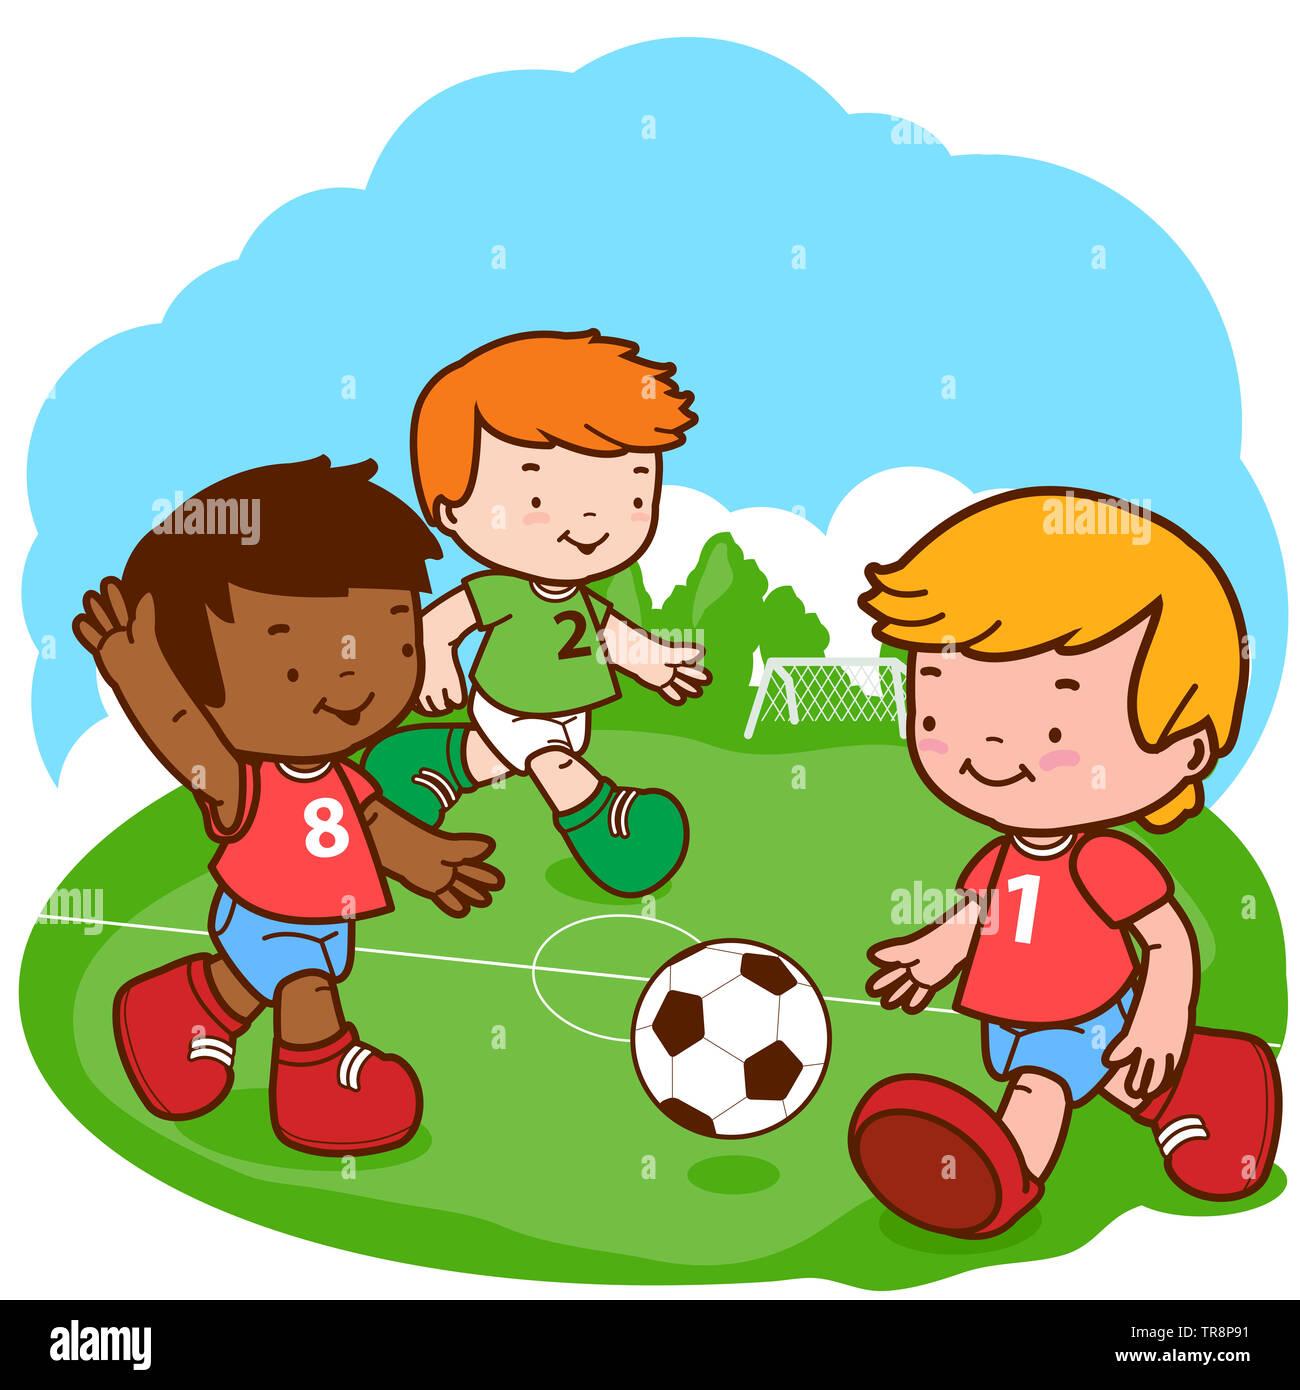 Illustration of three little boys play soccer. Stock Photo